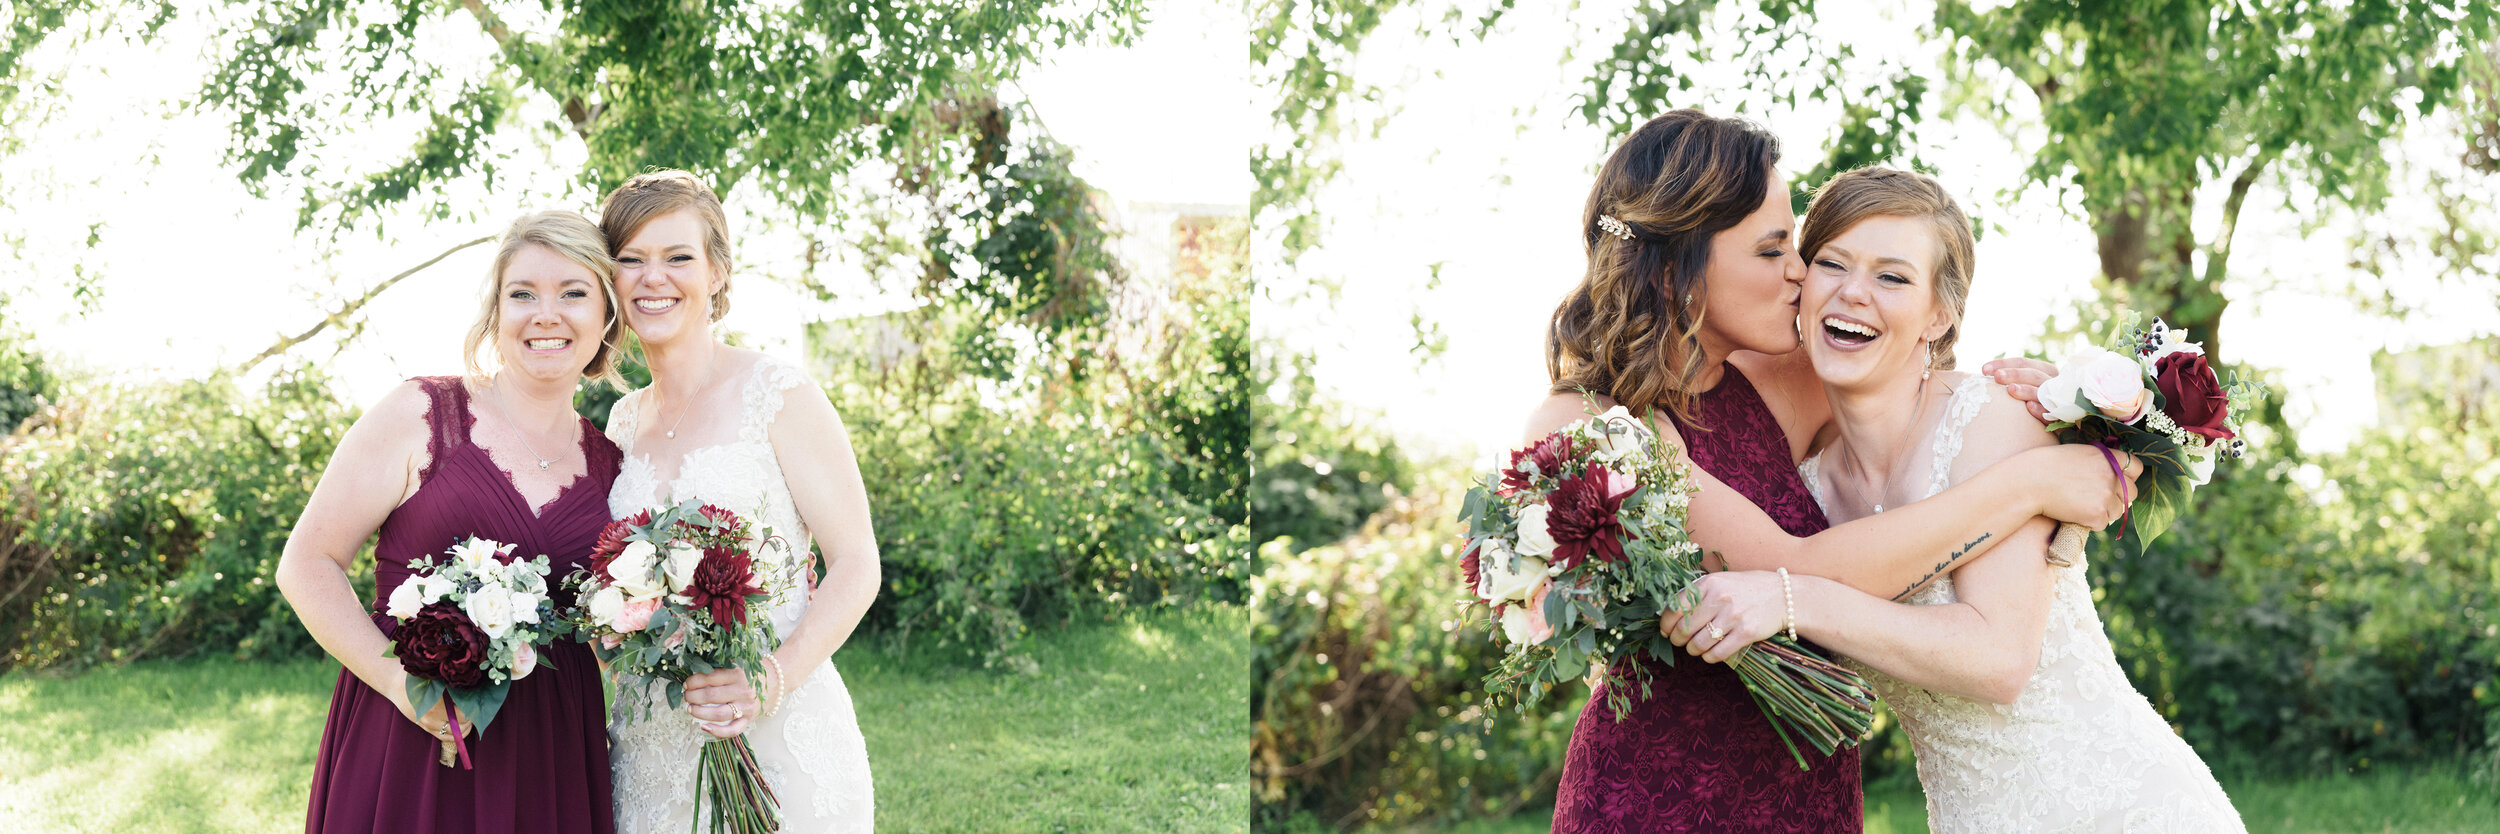 Bridesmaids 02.jpg